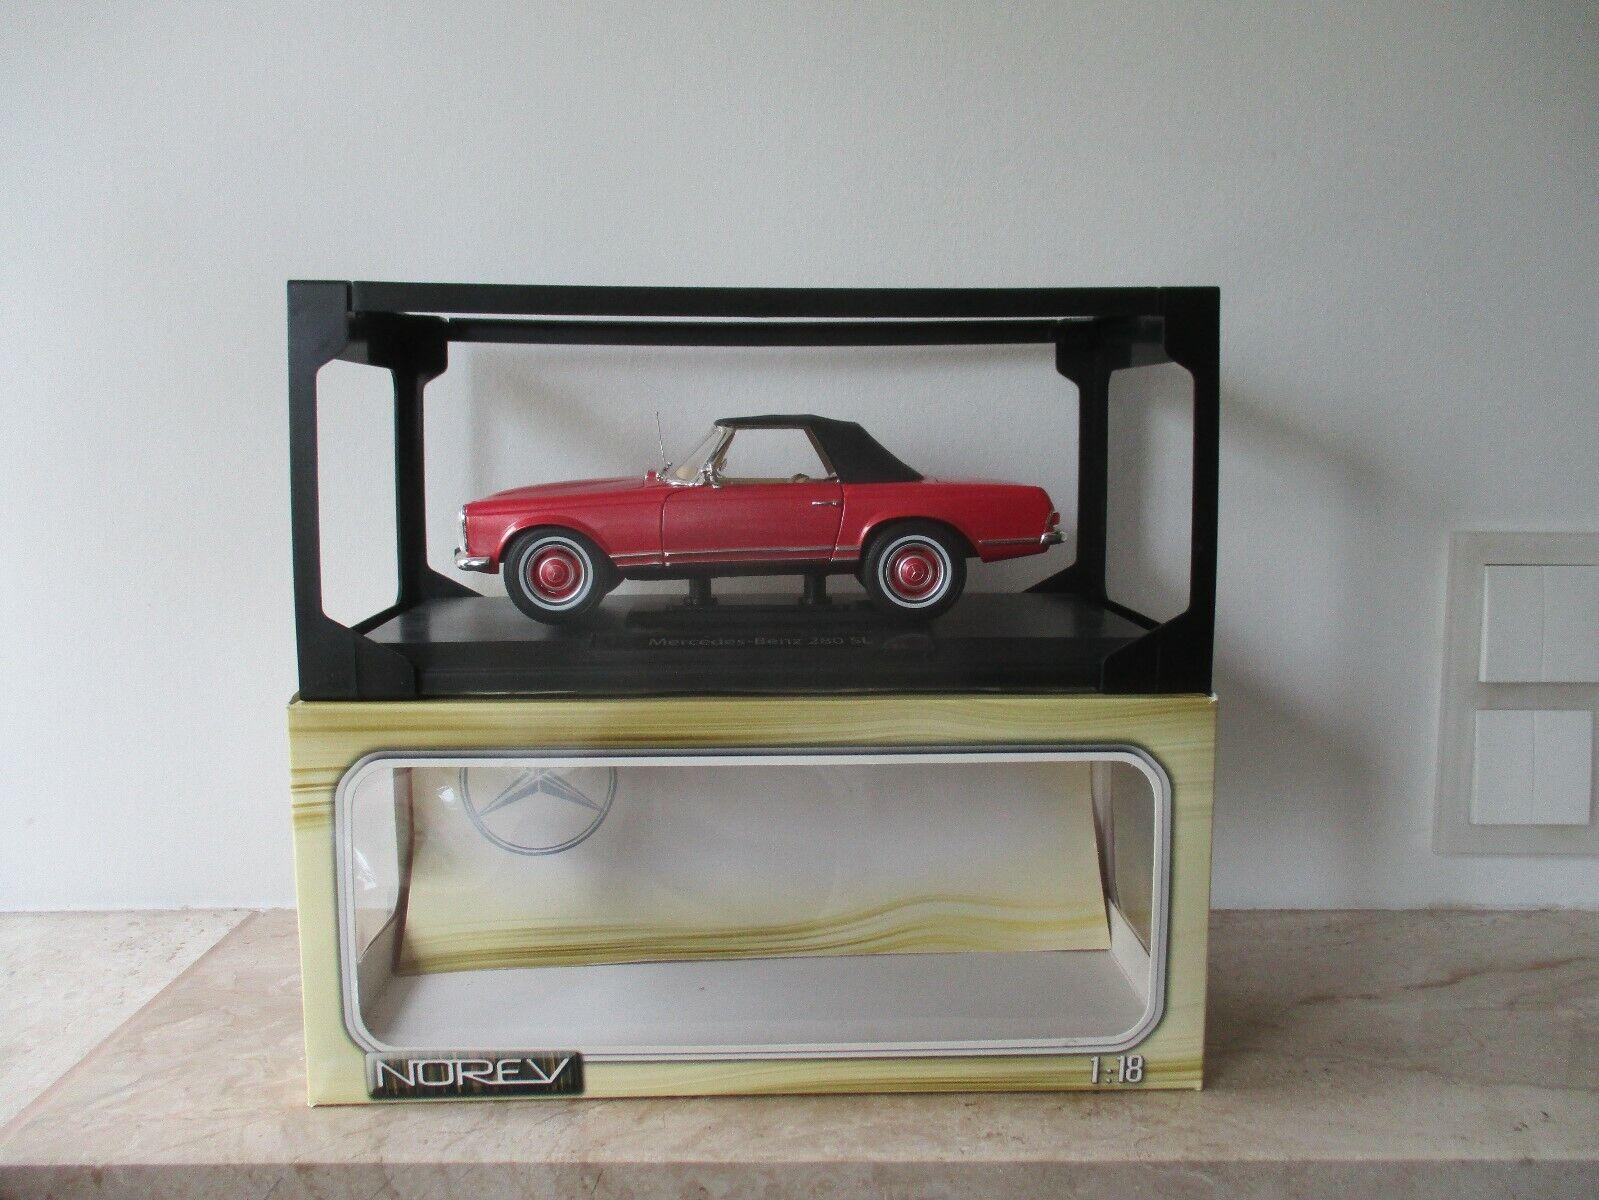 Antiguo coche modelo norev mercedes-benz 280 sl 1 18 con embalaje original